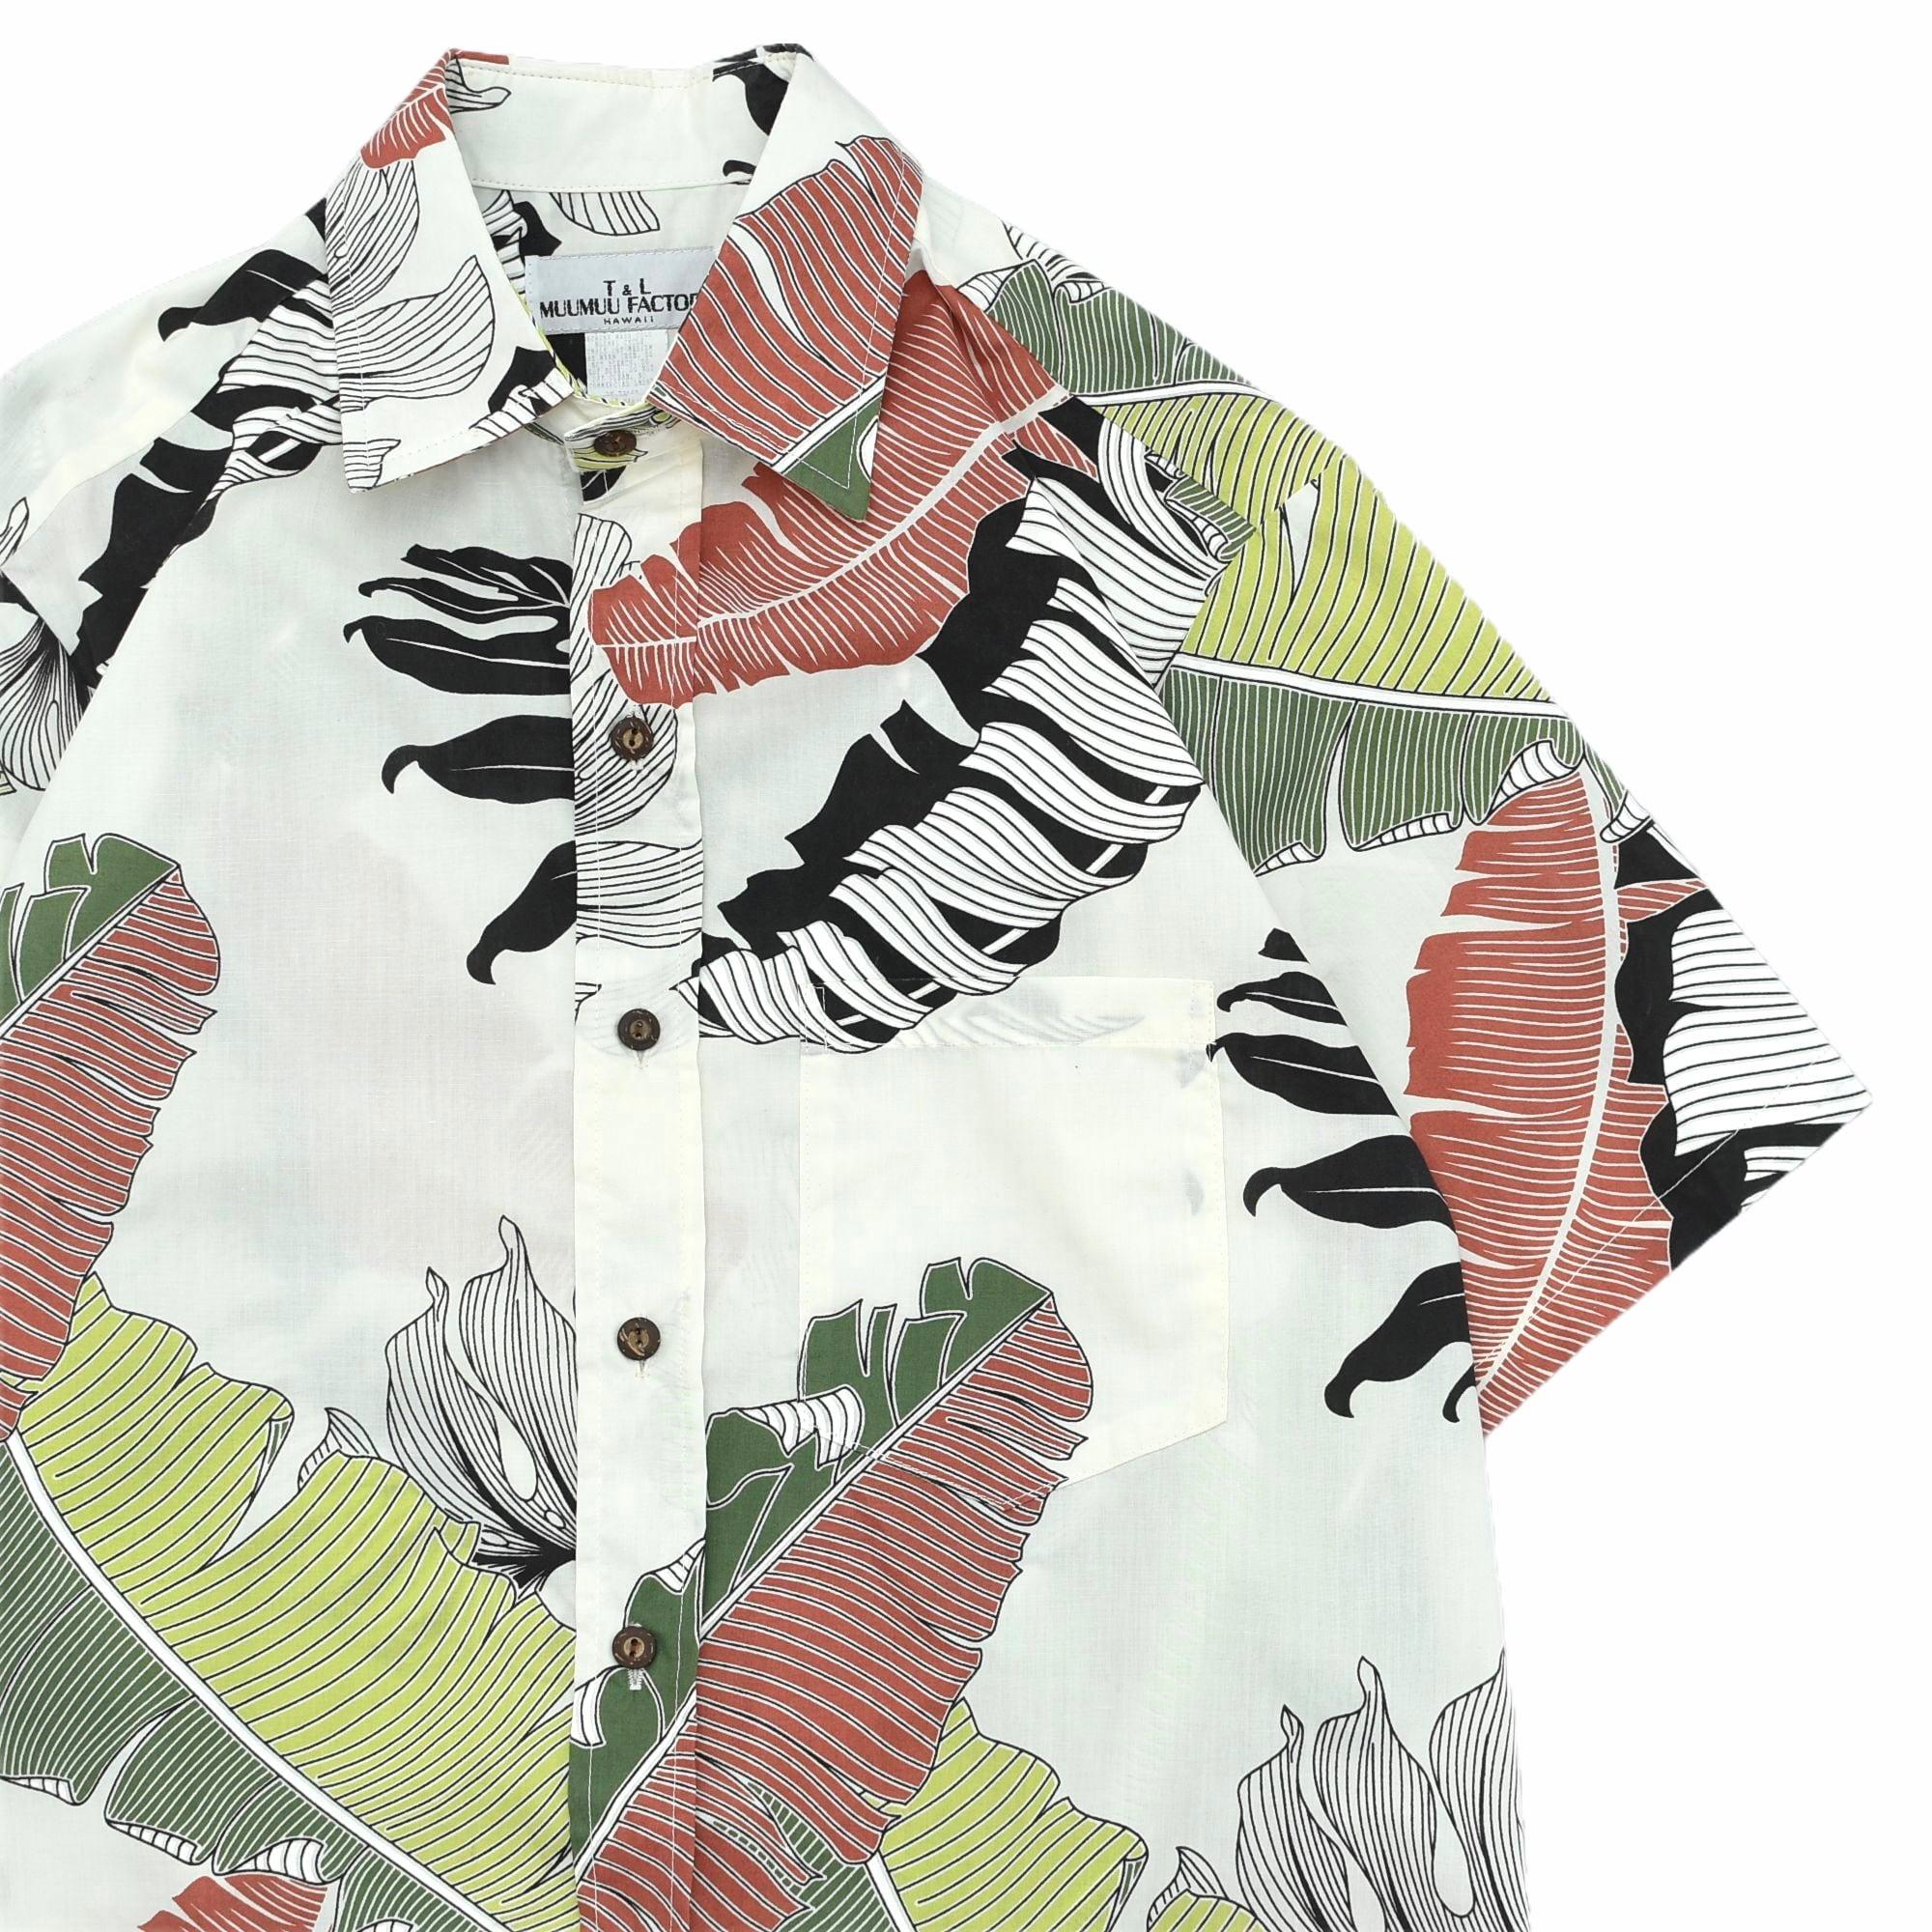 90s T&L MUUMUU FACTORY aloha shirt Made in Hawaii